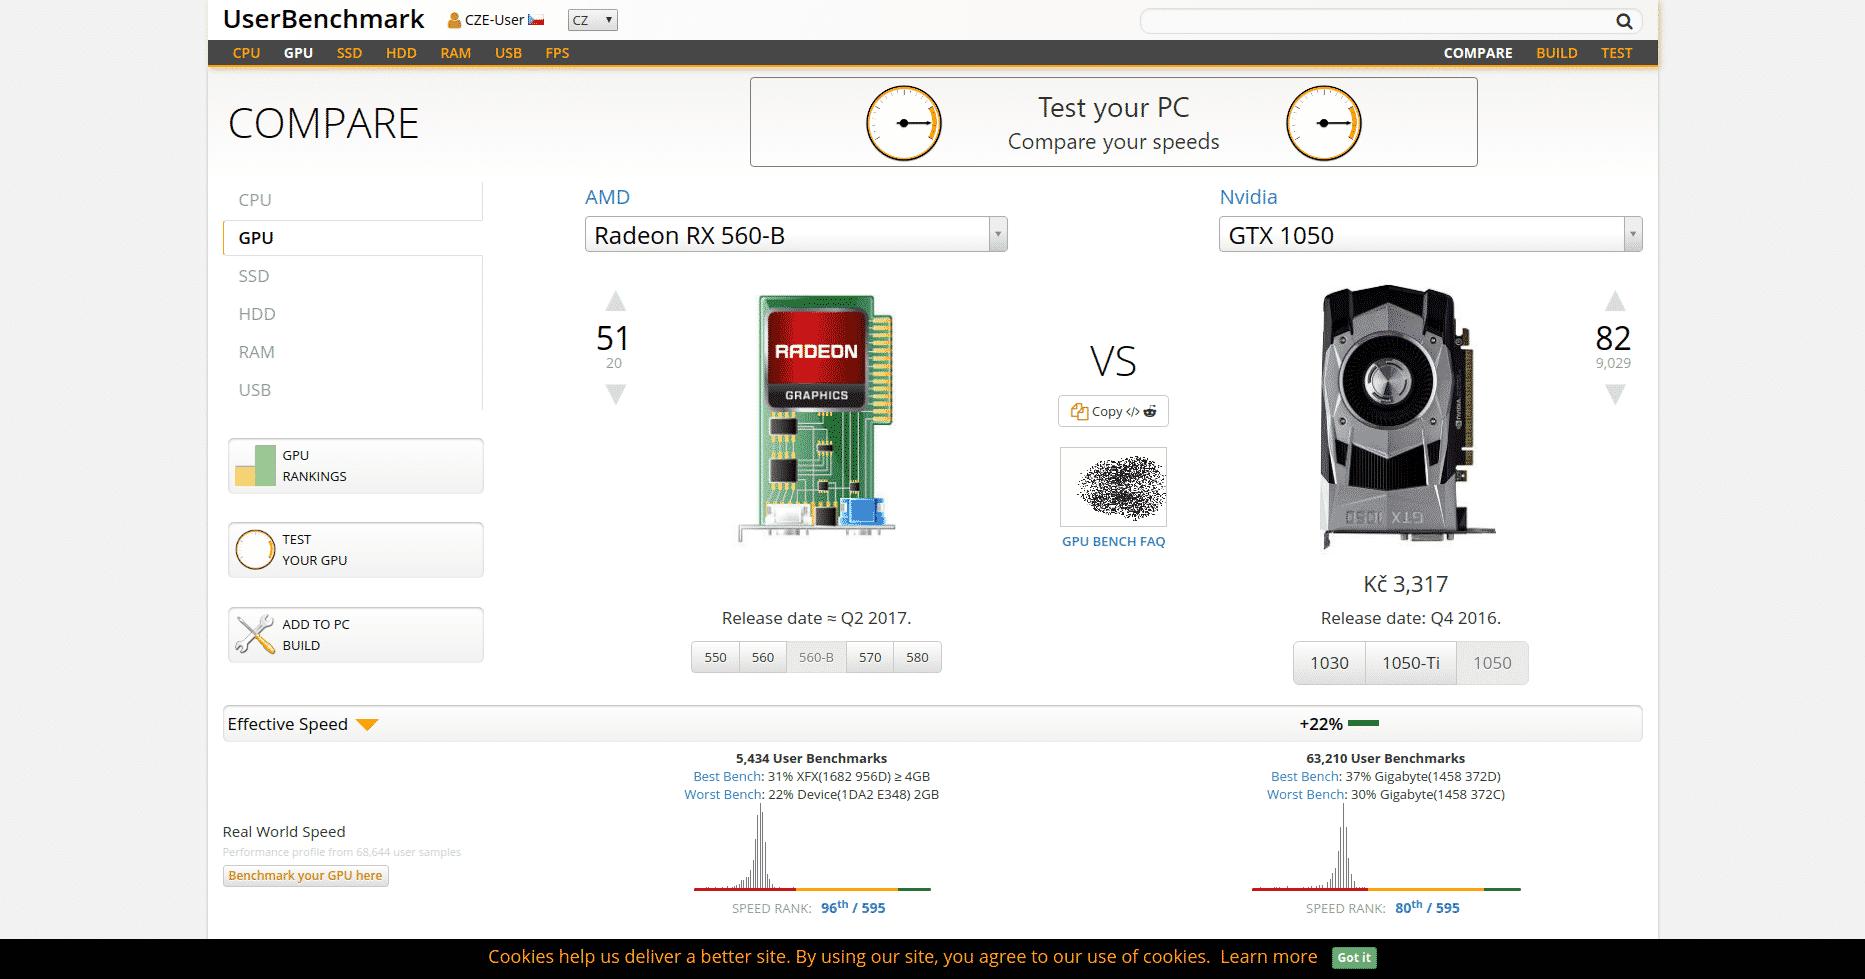 UserBenchmark.com - RX 560-B vs GTX 1050